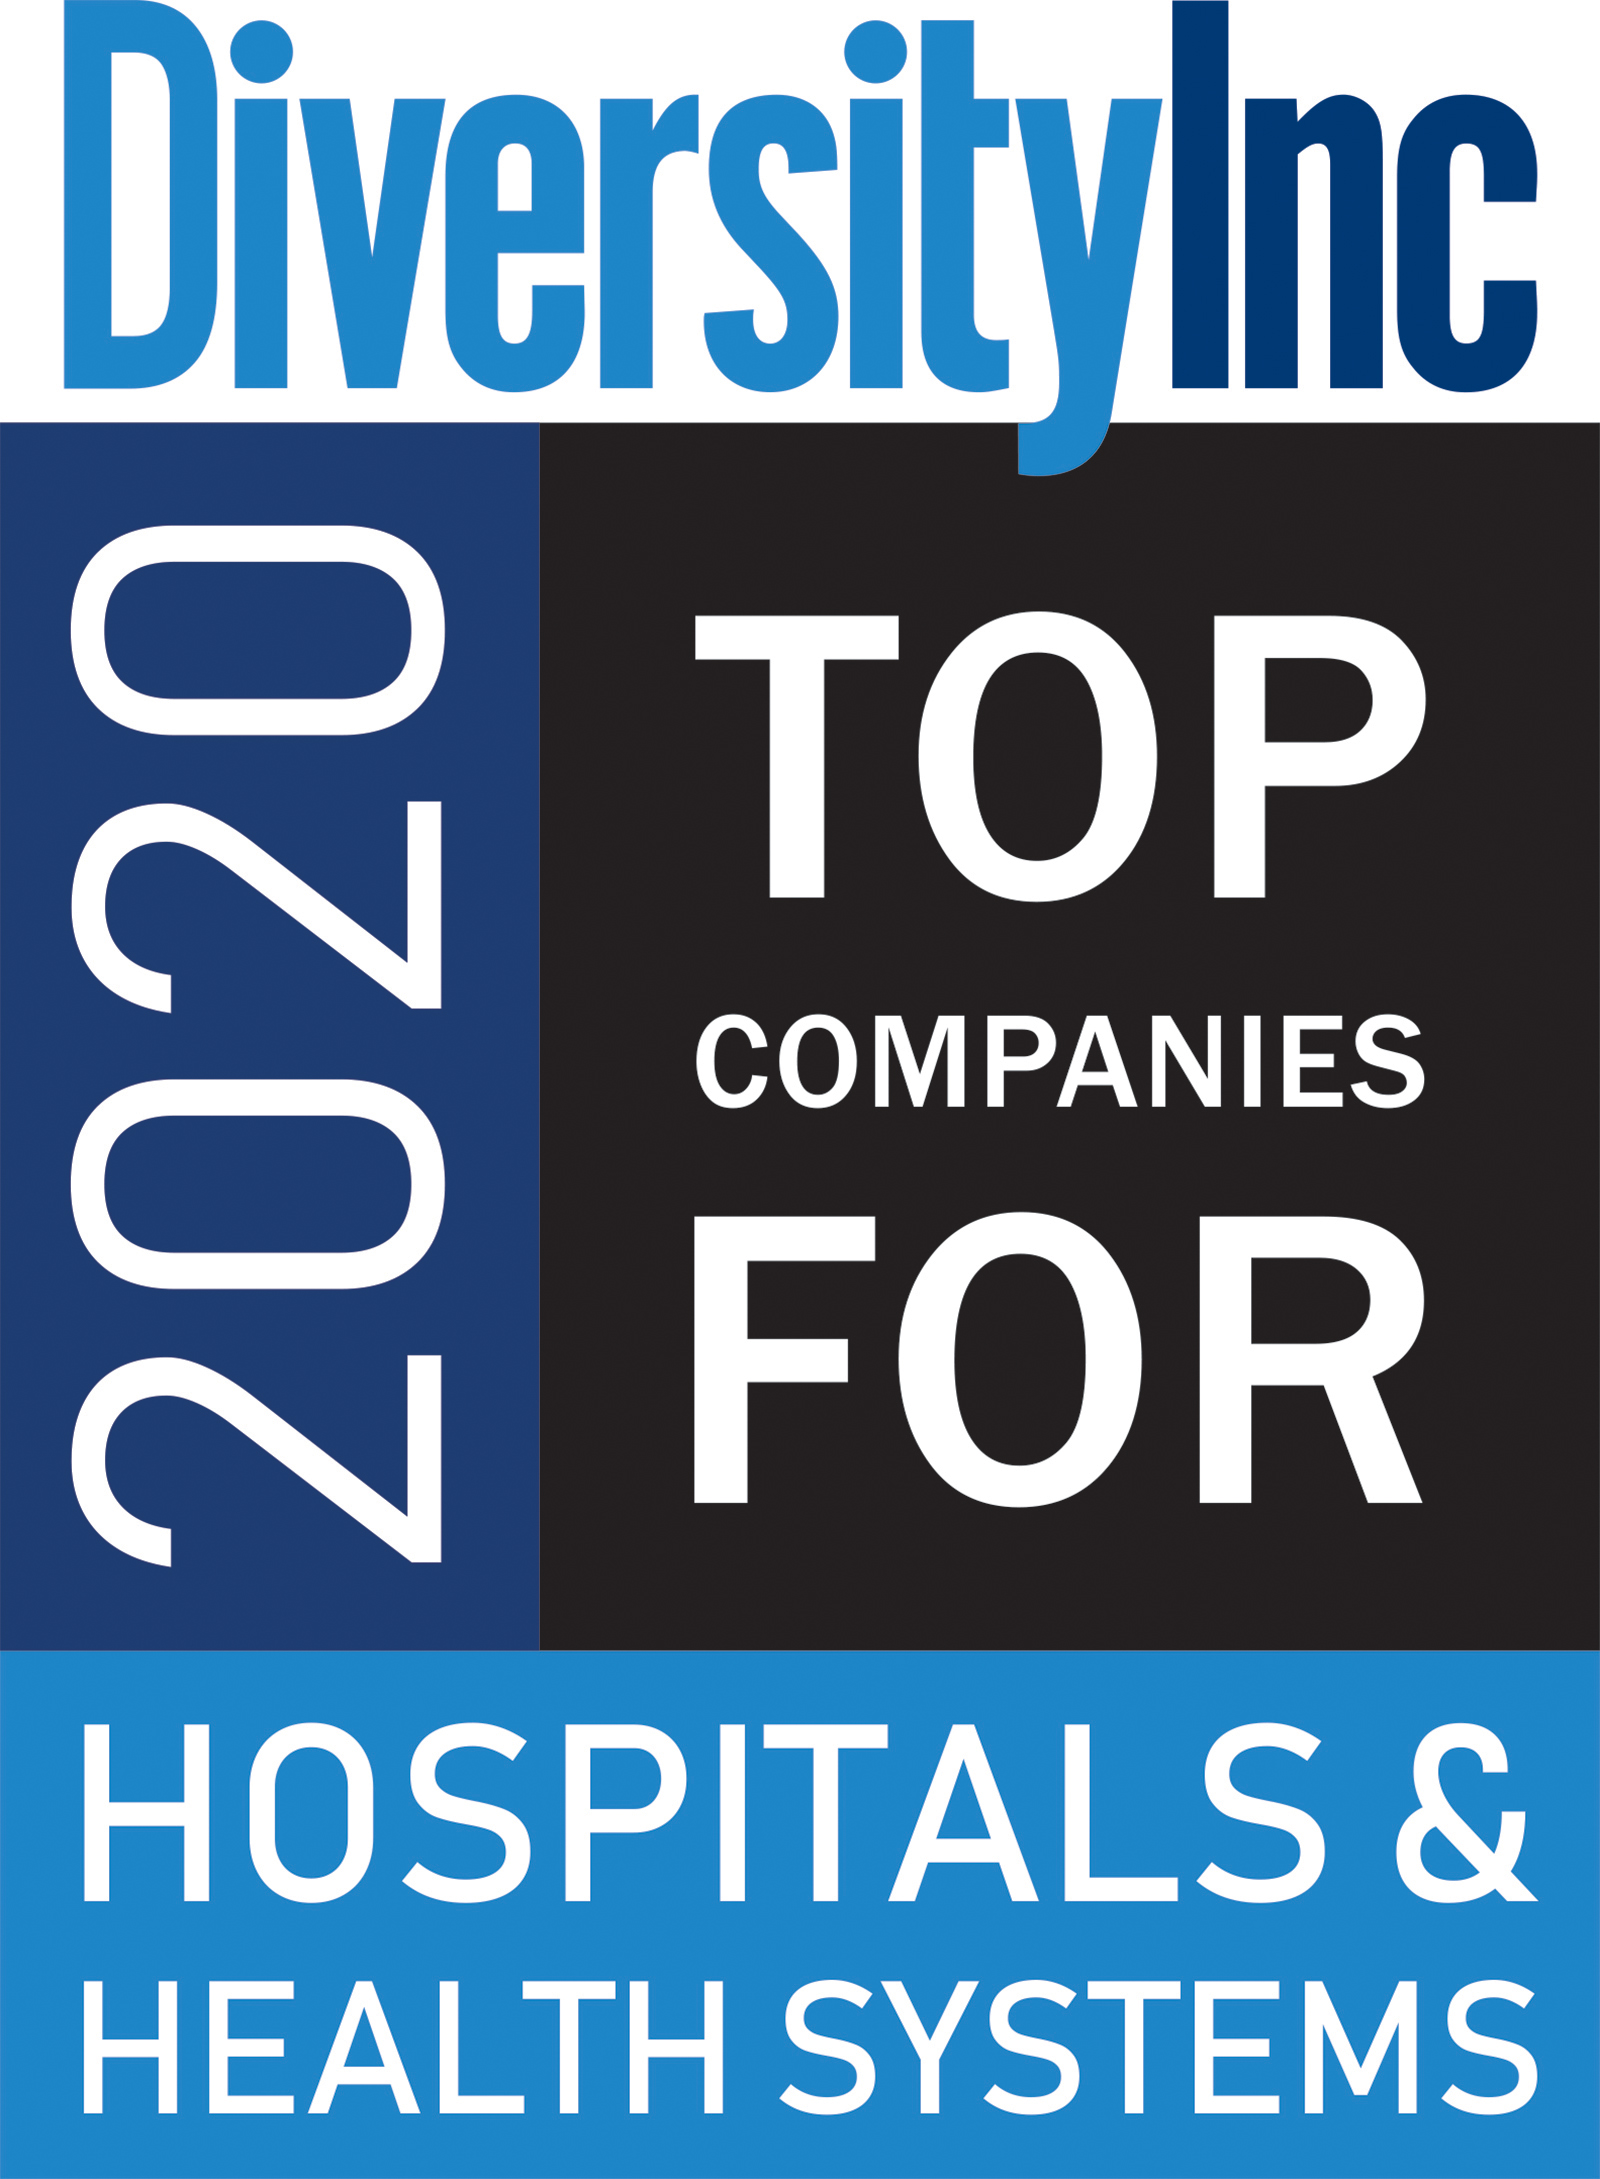 Hospitals Health Systems